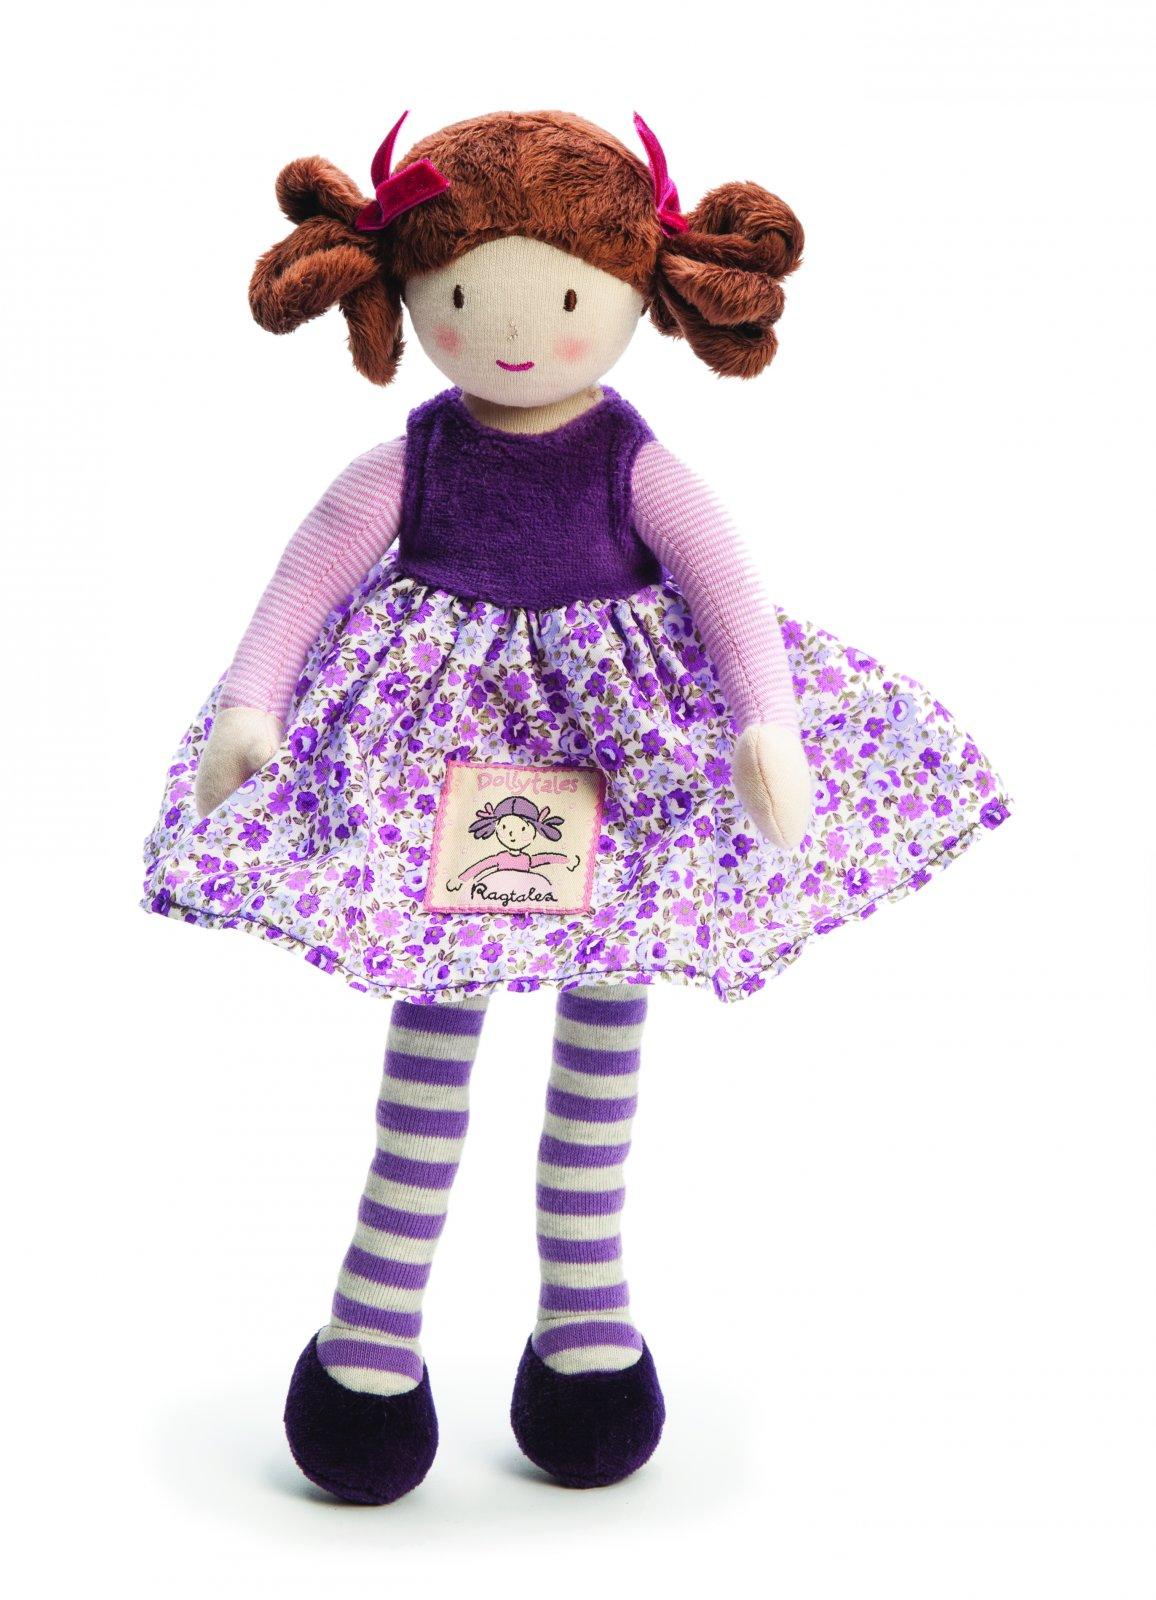 Ragtales Tilly Rag Doll 107